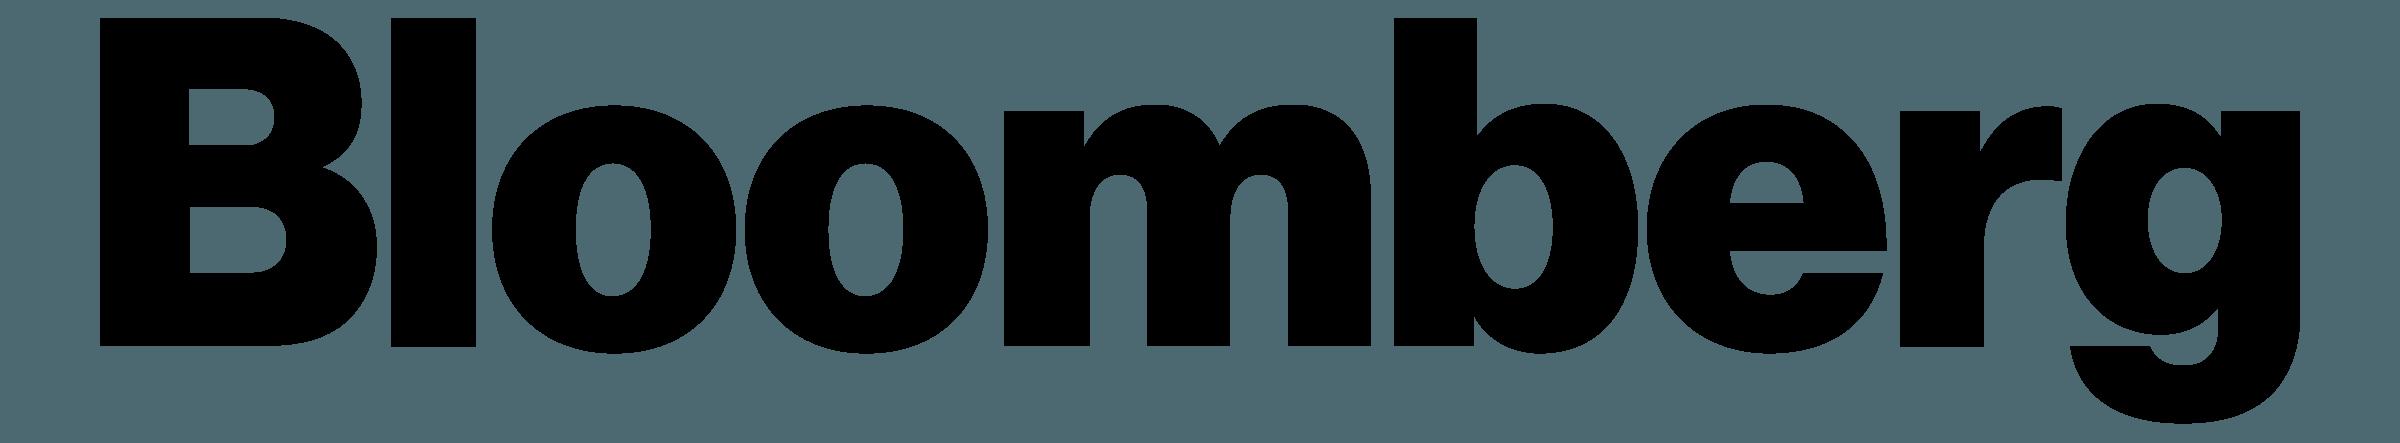 MILTZEN SUN W/ Metal Nose Pads | Timeless Round Glasses | MOSCOT